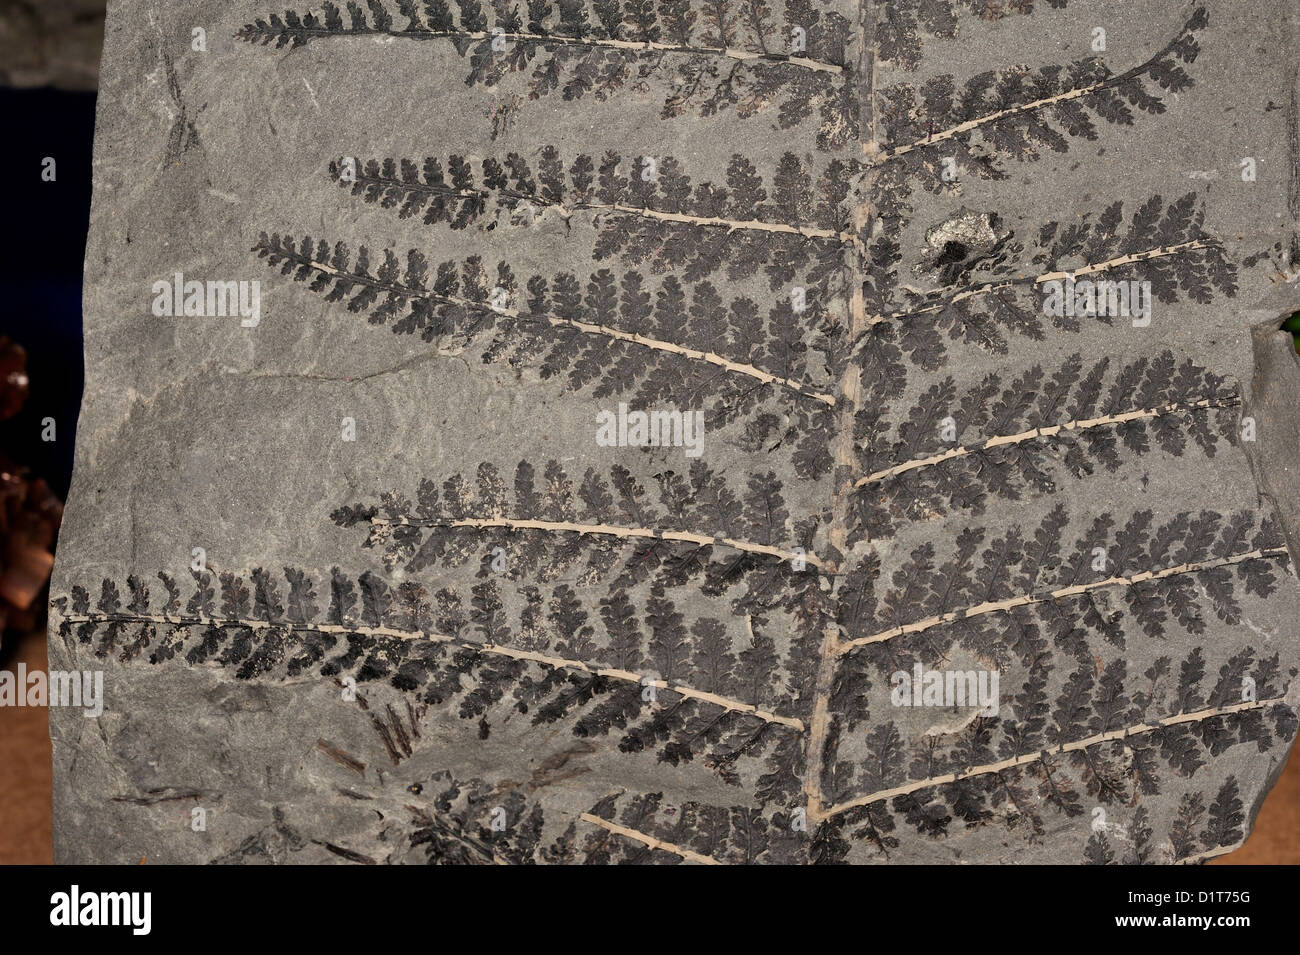 Fossil fern, Schizostachys pinnata, Plantae; Tracheophyta; Equisetales; Calamitaceae; Usa - Stock Image